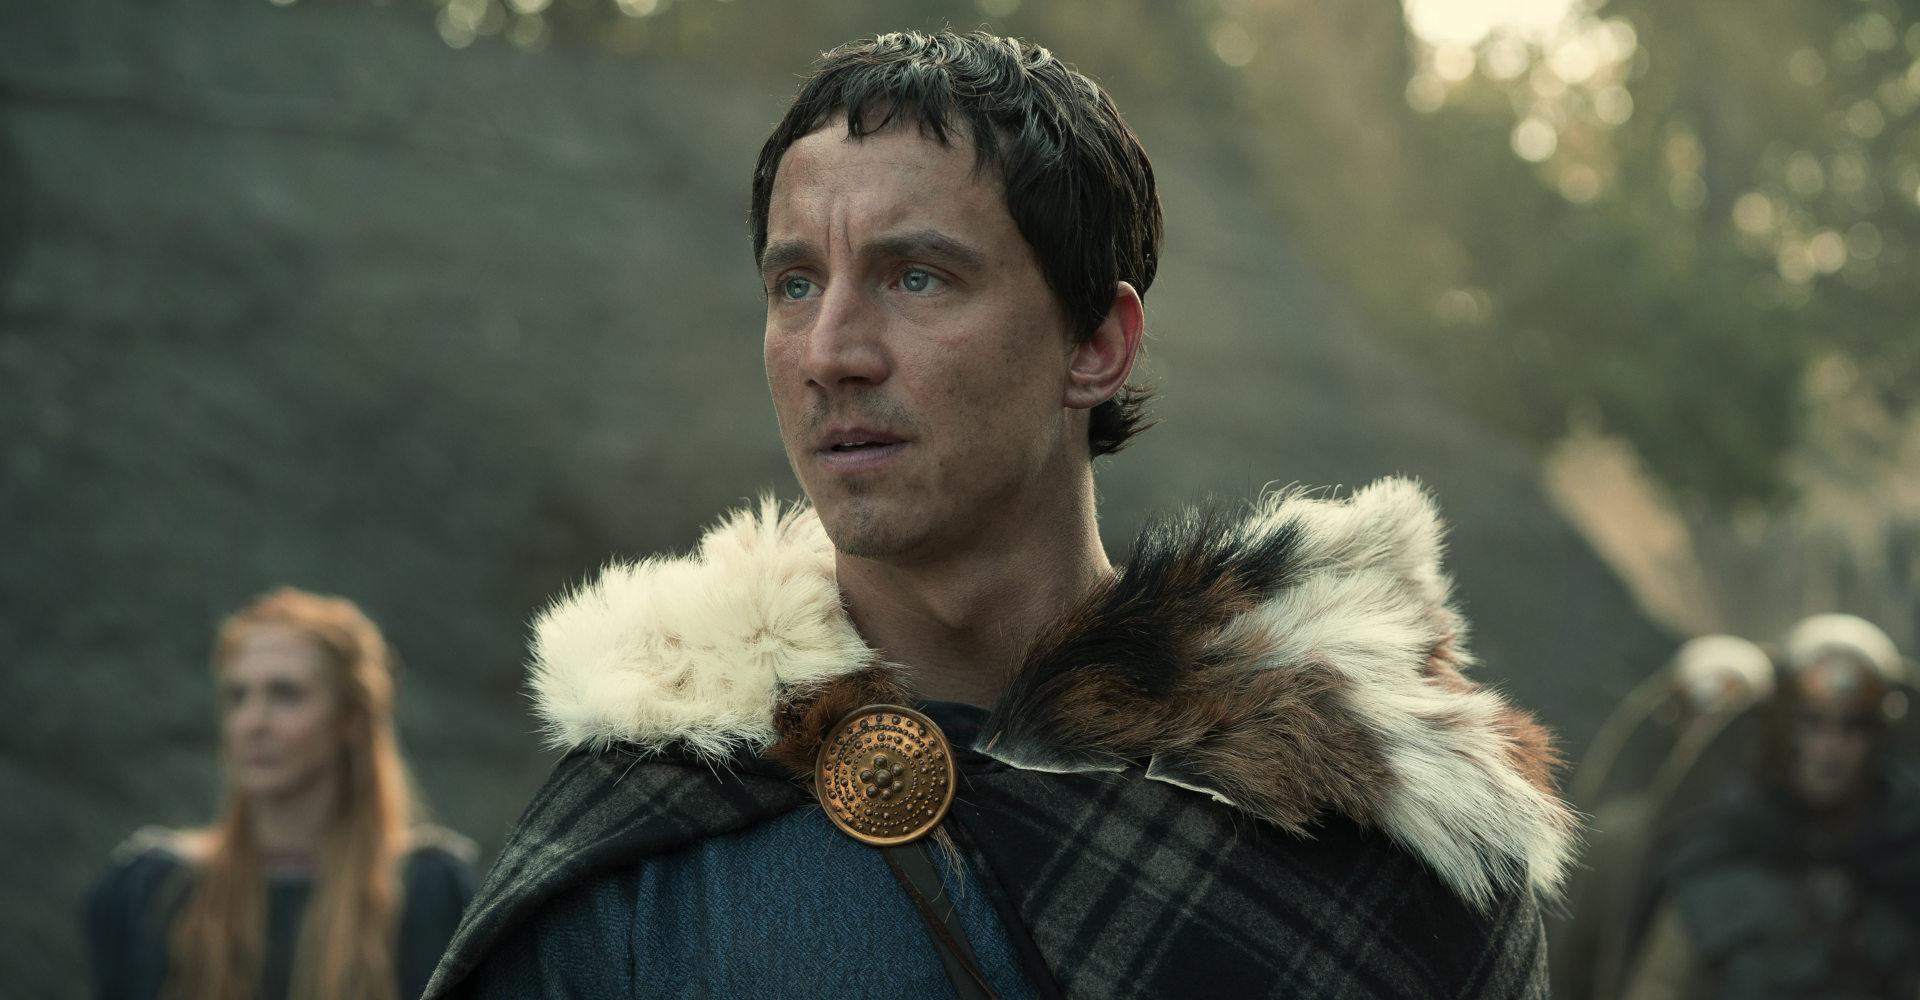 Laurence Rupp als Arminius in der Netflix-Serie Barbaren